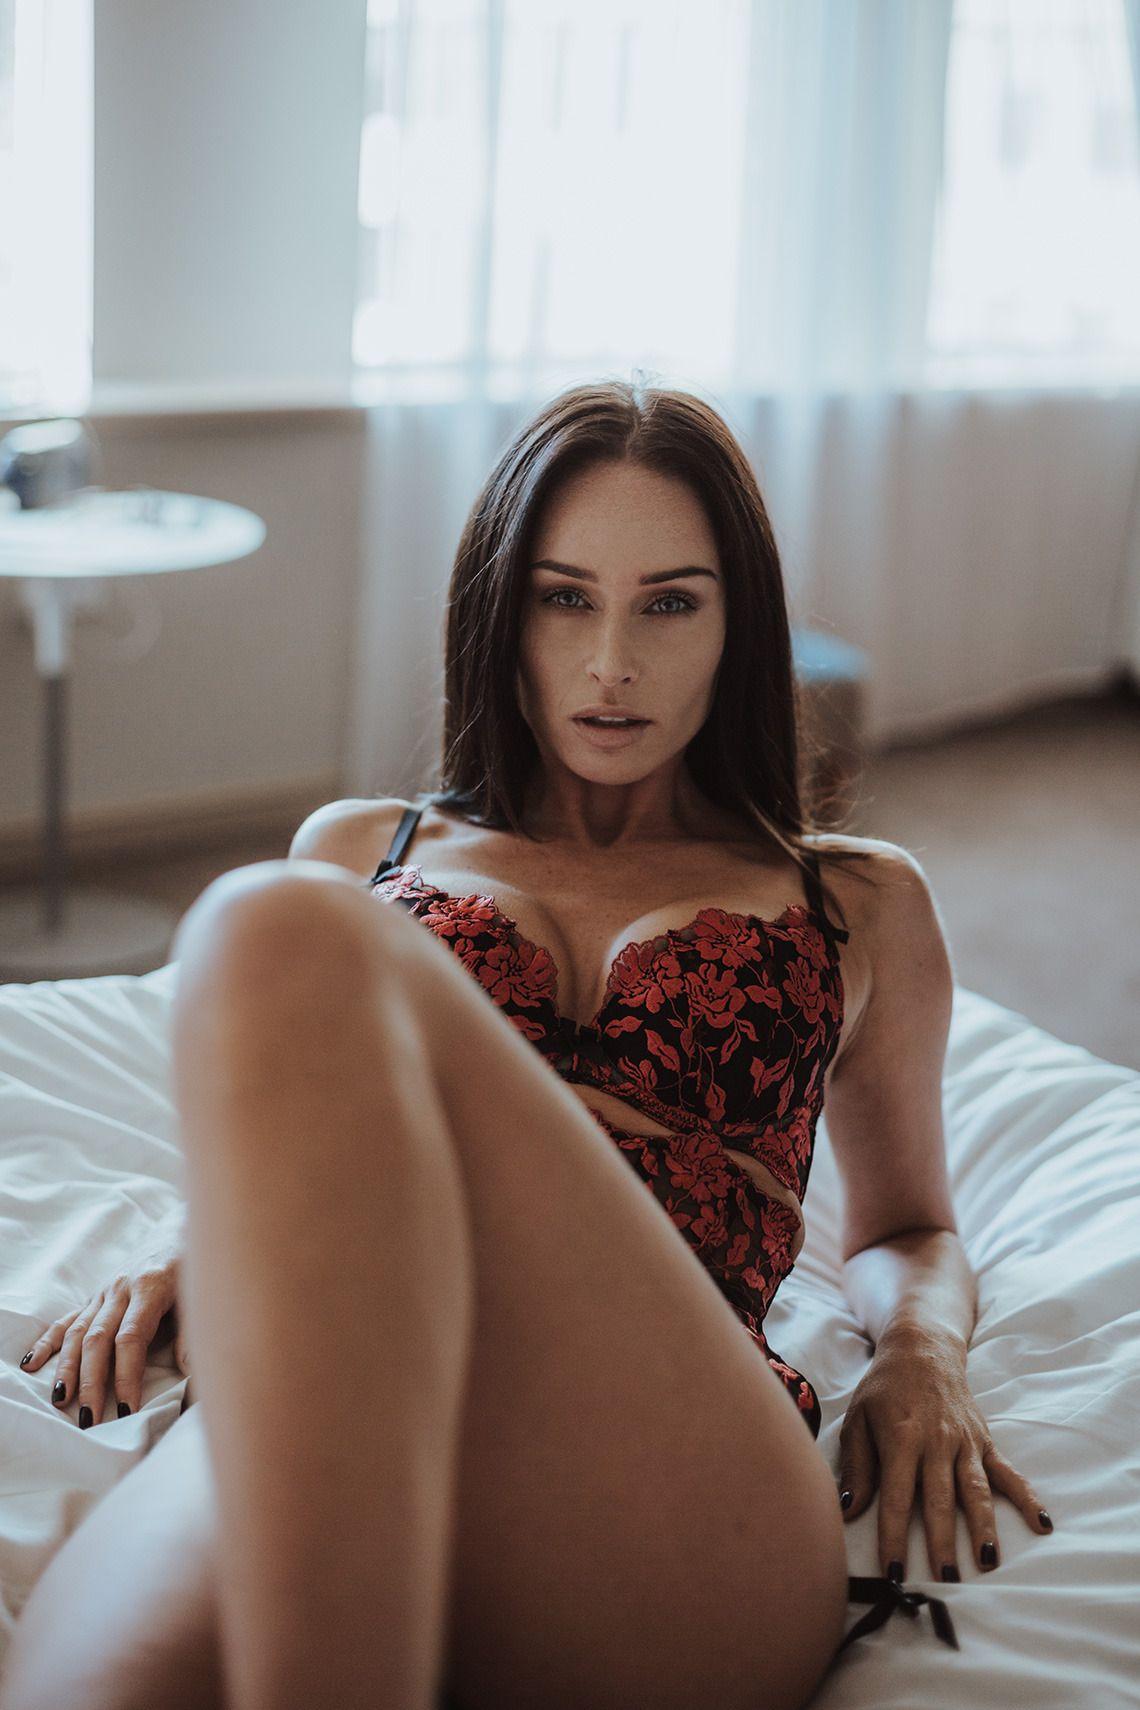 Hannah murray britain detroit premiere in london uk,Bring on the Brits! Nude Celebs Forum Porno pics & movies Danielle Lloyd Sexy - 67 Photos,Ines garcia see through